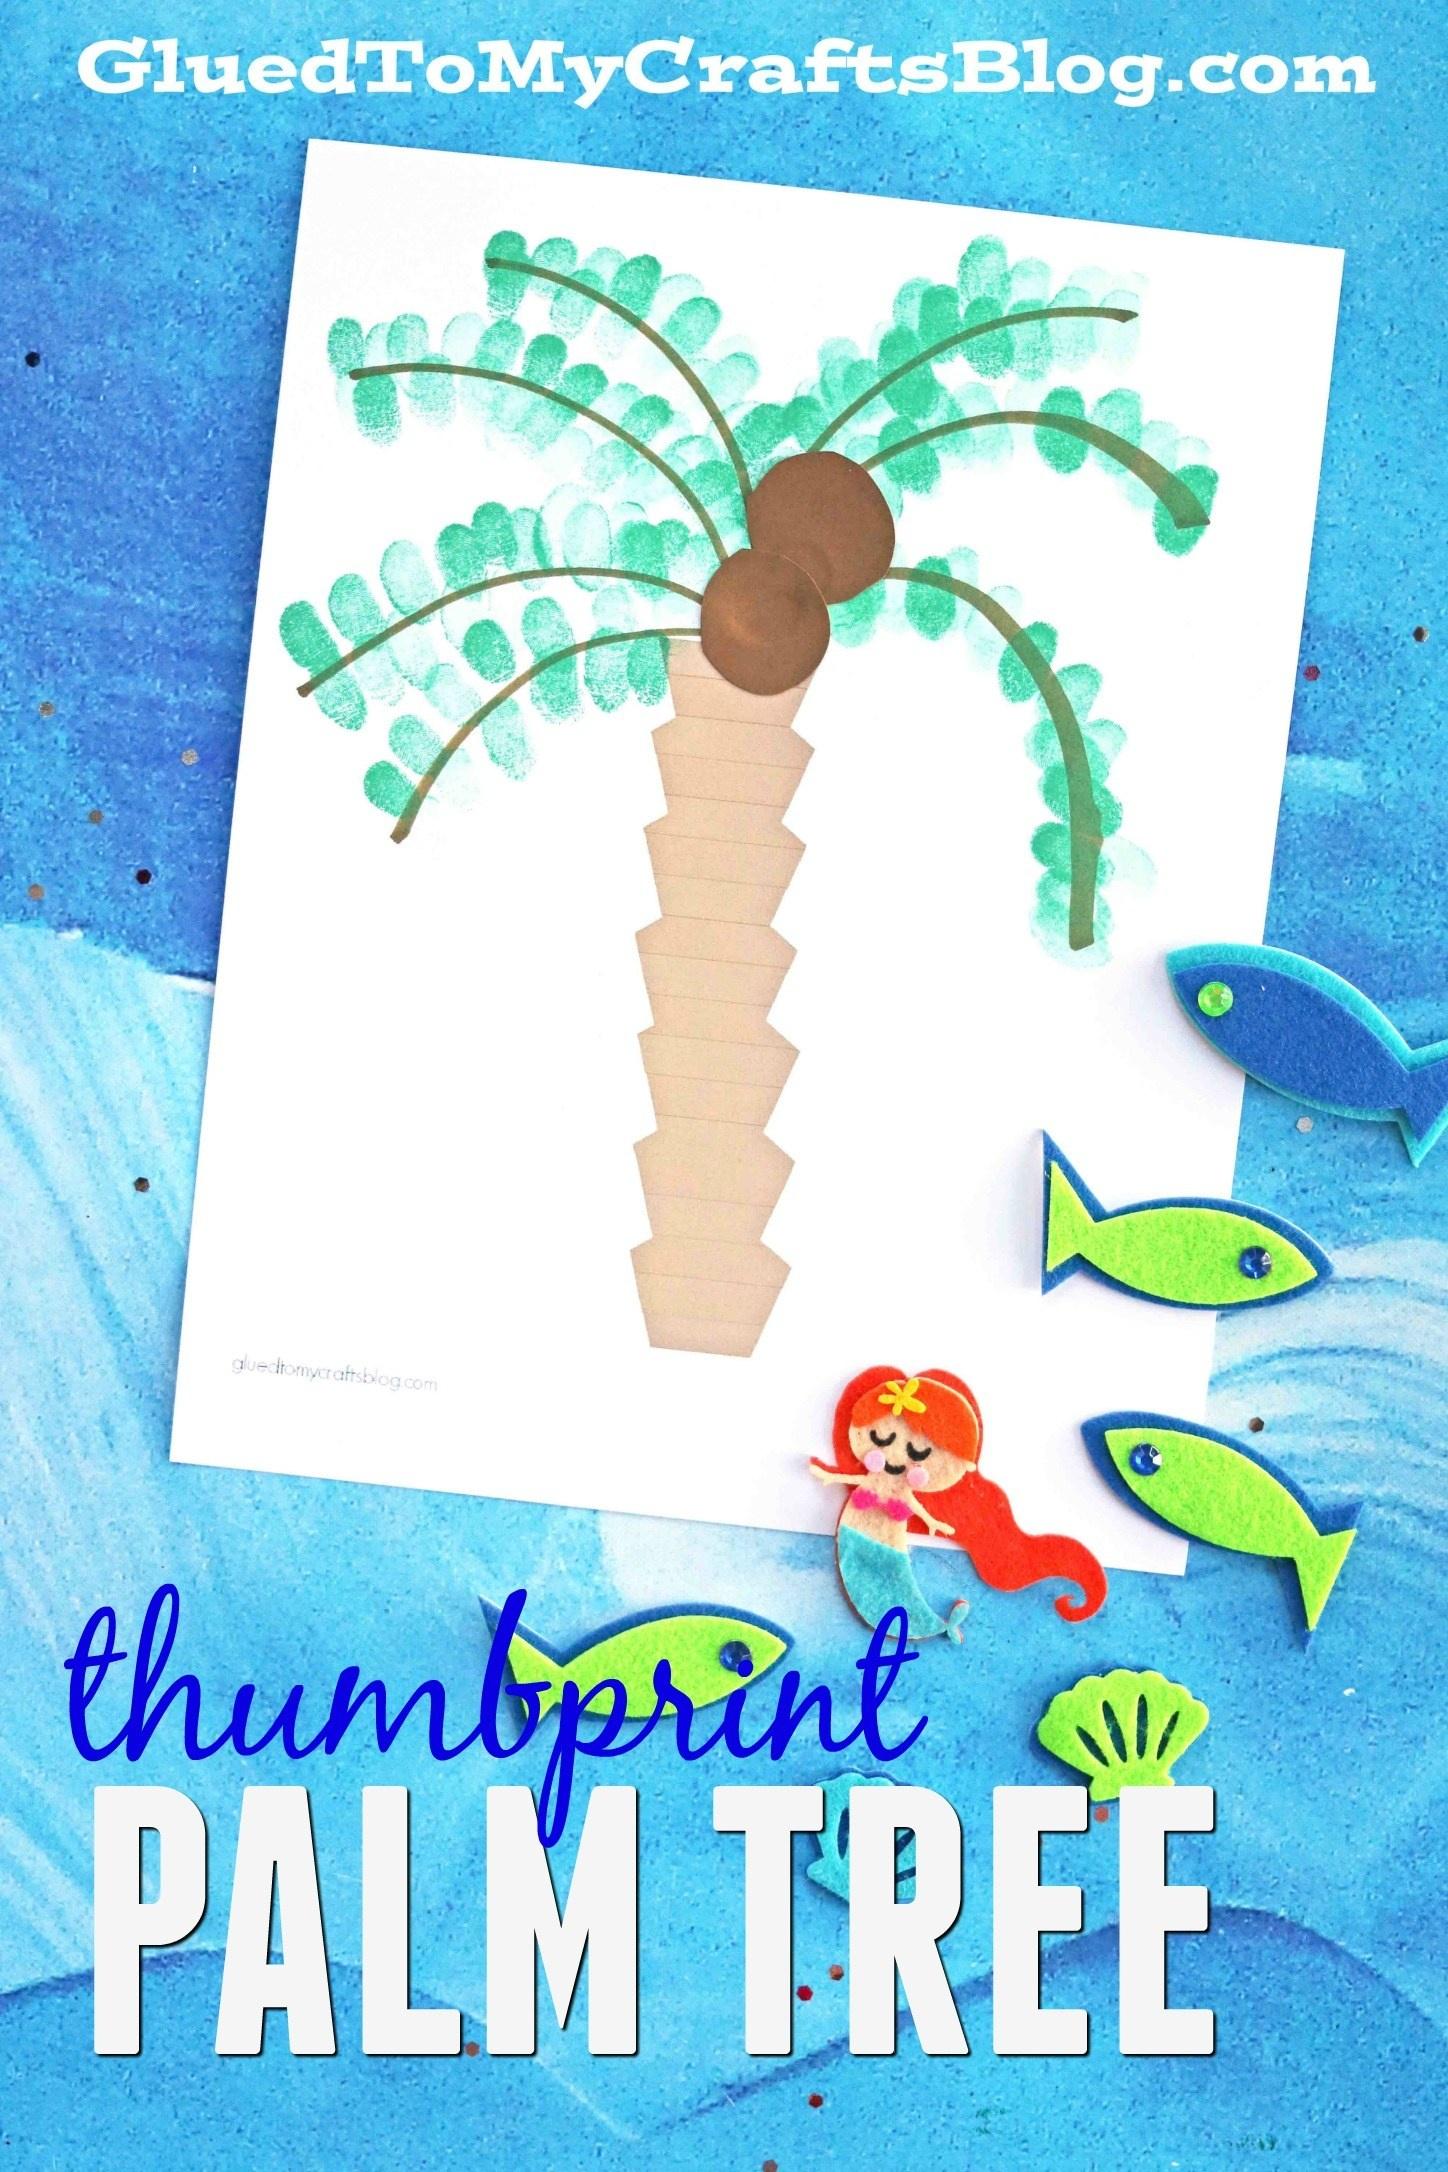 Thumbprint Palm Tree W/free Printable Template - Glued To My Crafts - Free Printable Palm Tree Template